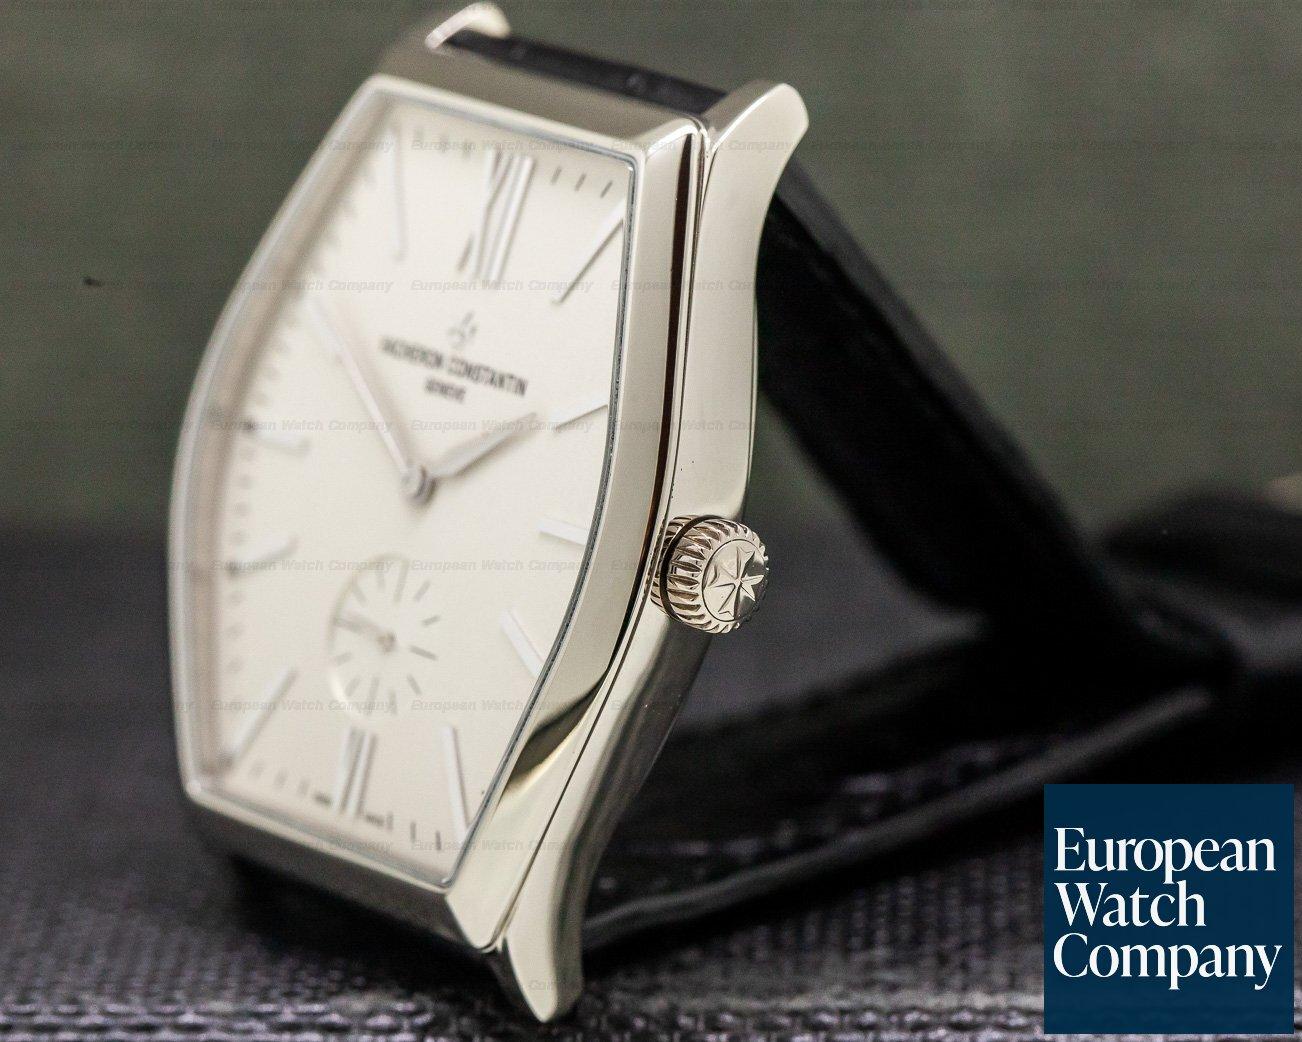 Vacheron Constantin 82230/000g-9962 Malte Small Seconds Manual Silver Dial 18K White Gold